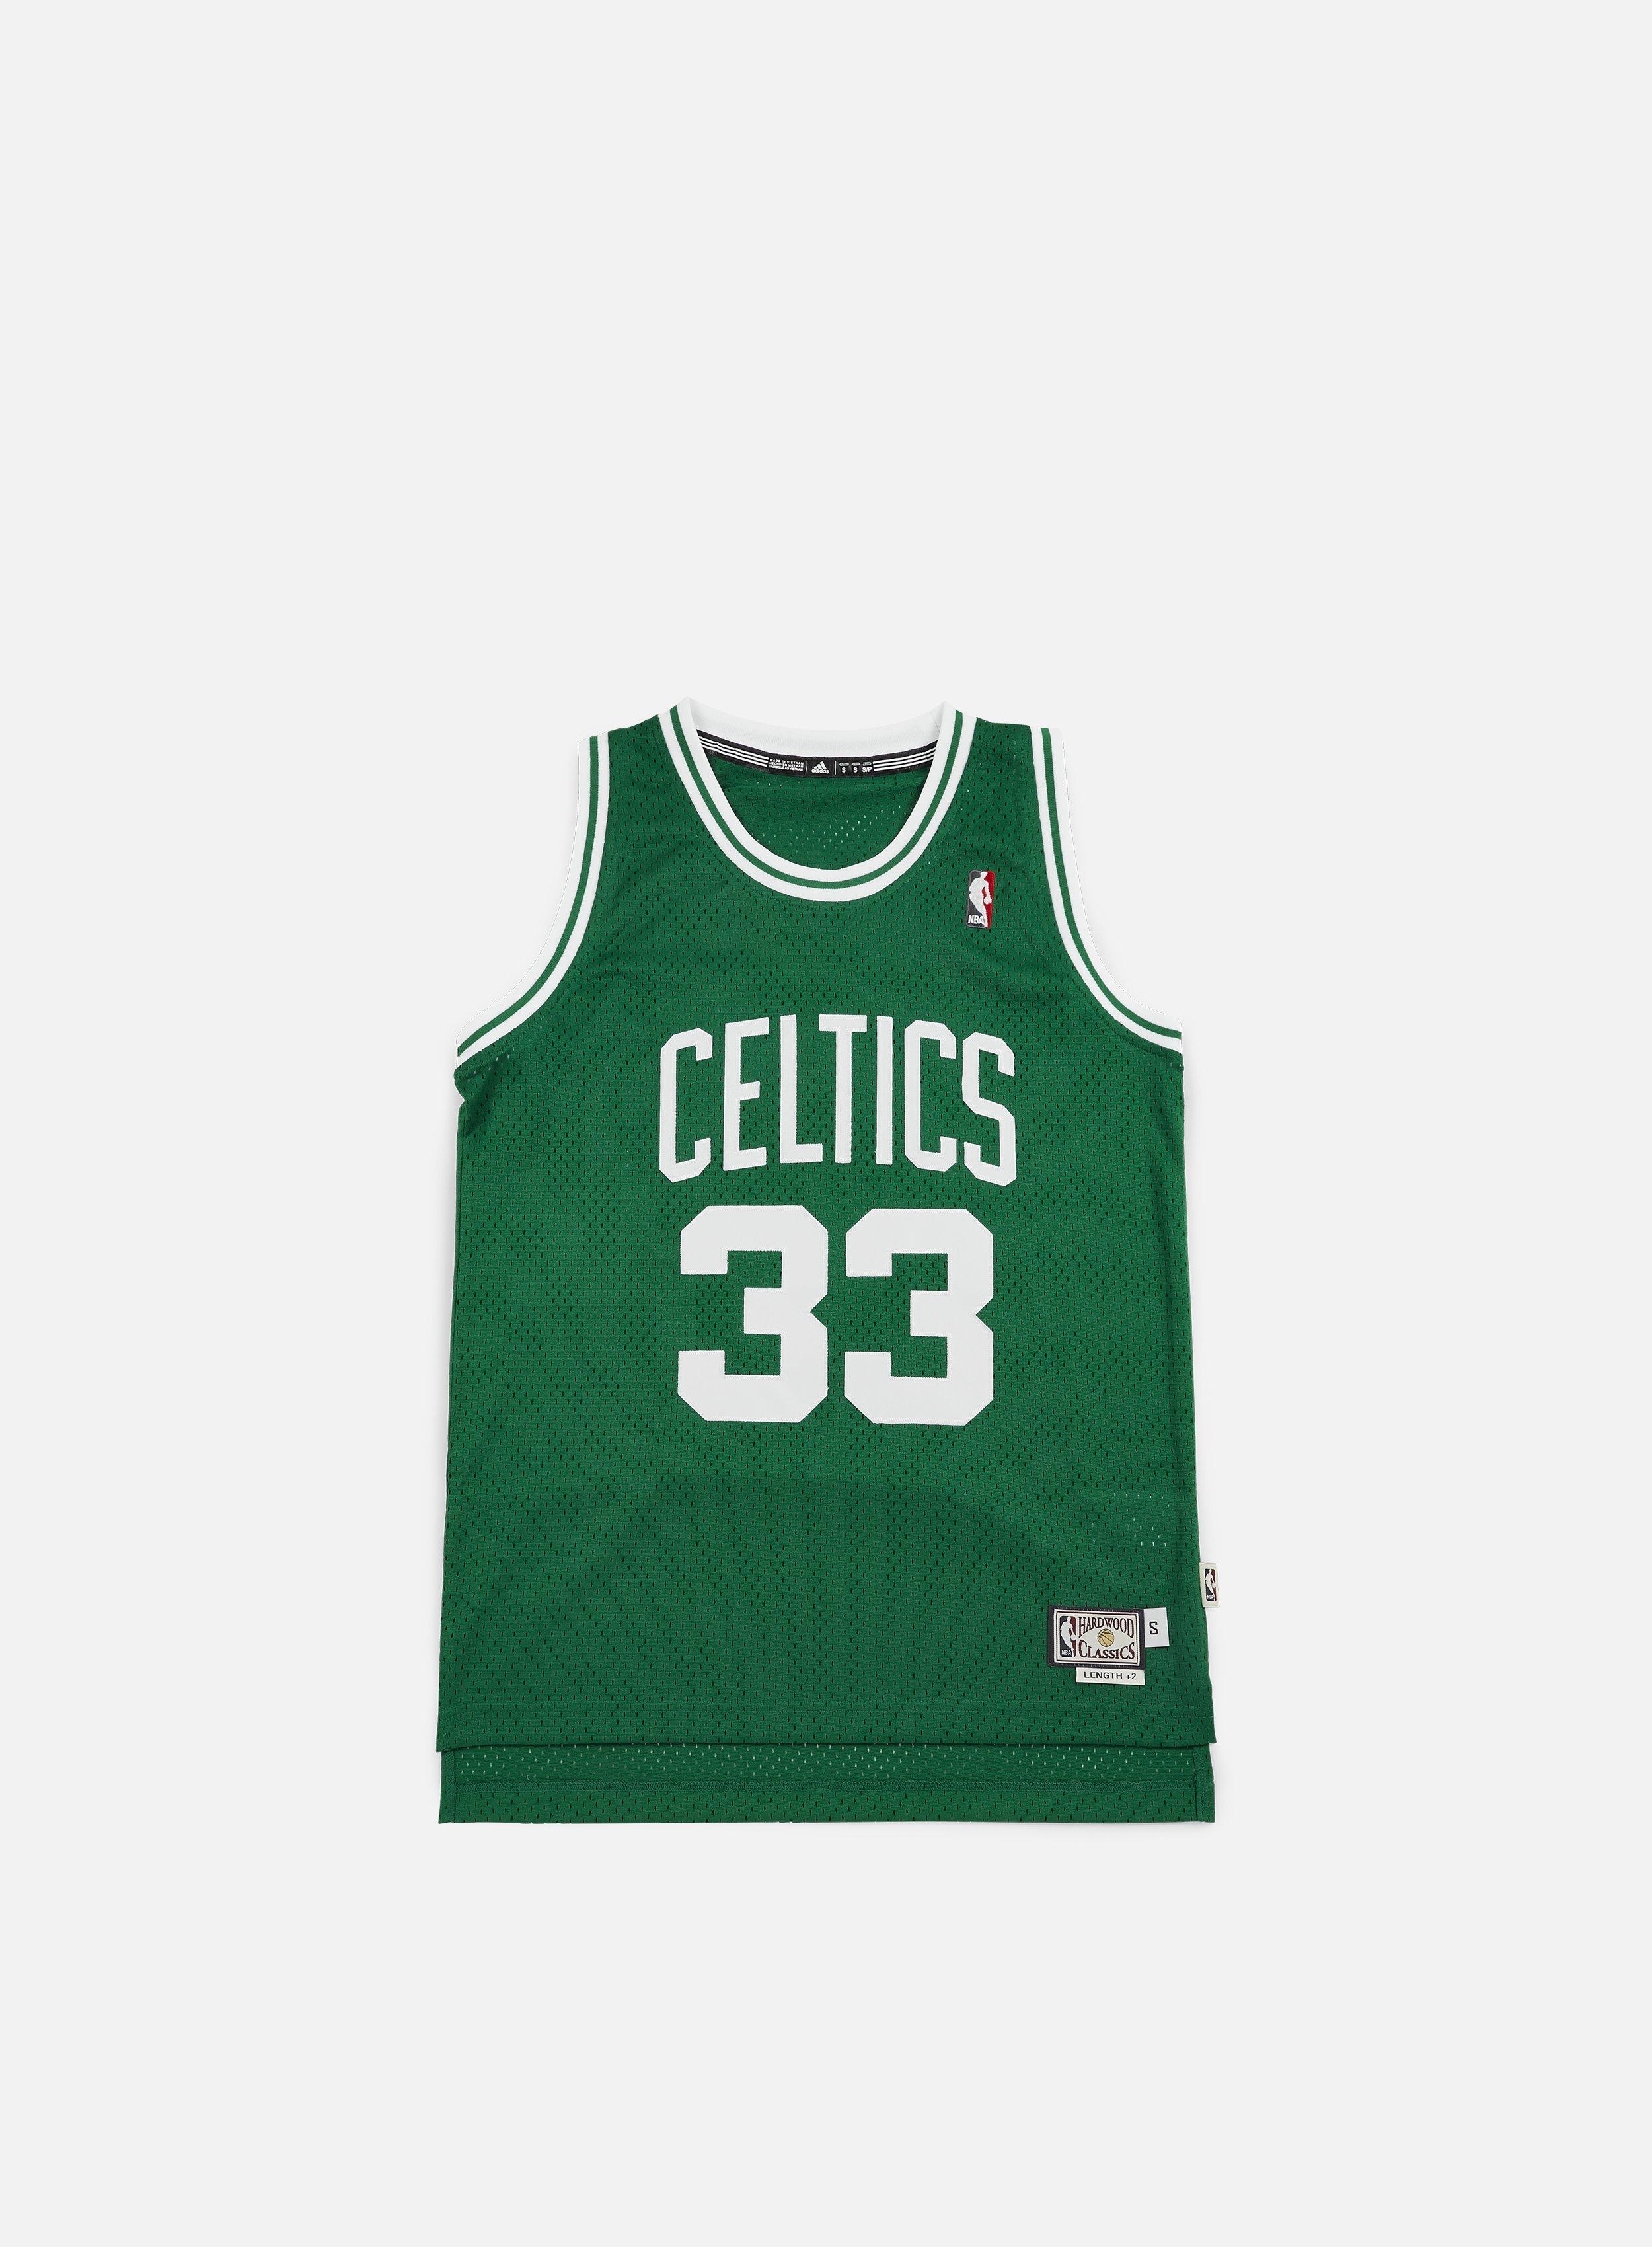 Boston Celtics Retired Jersey Larry Bird